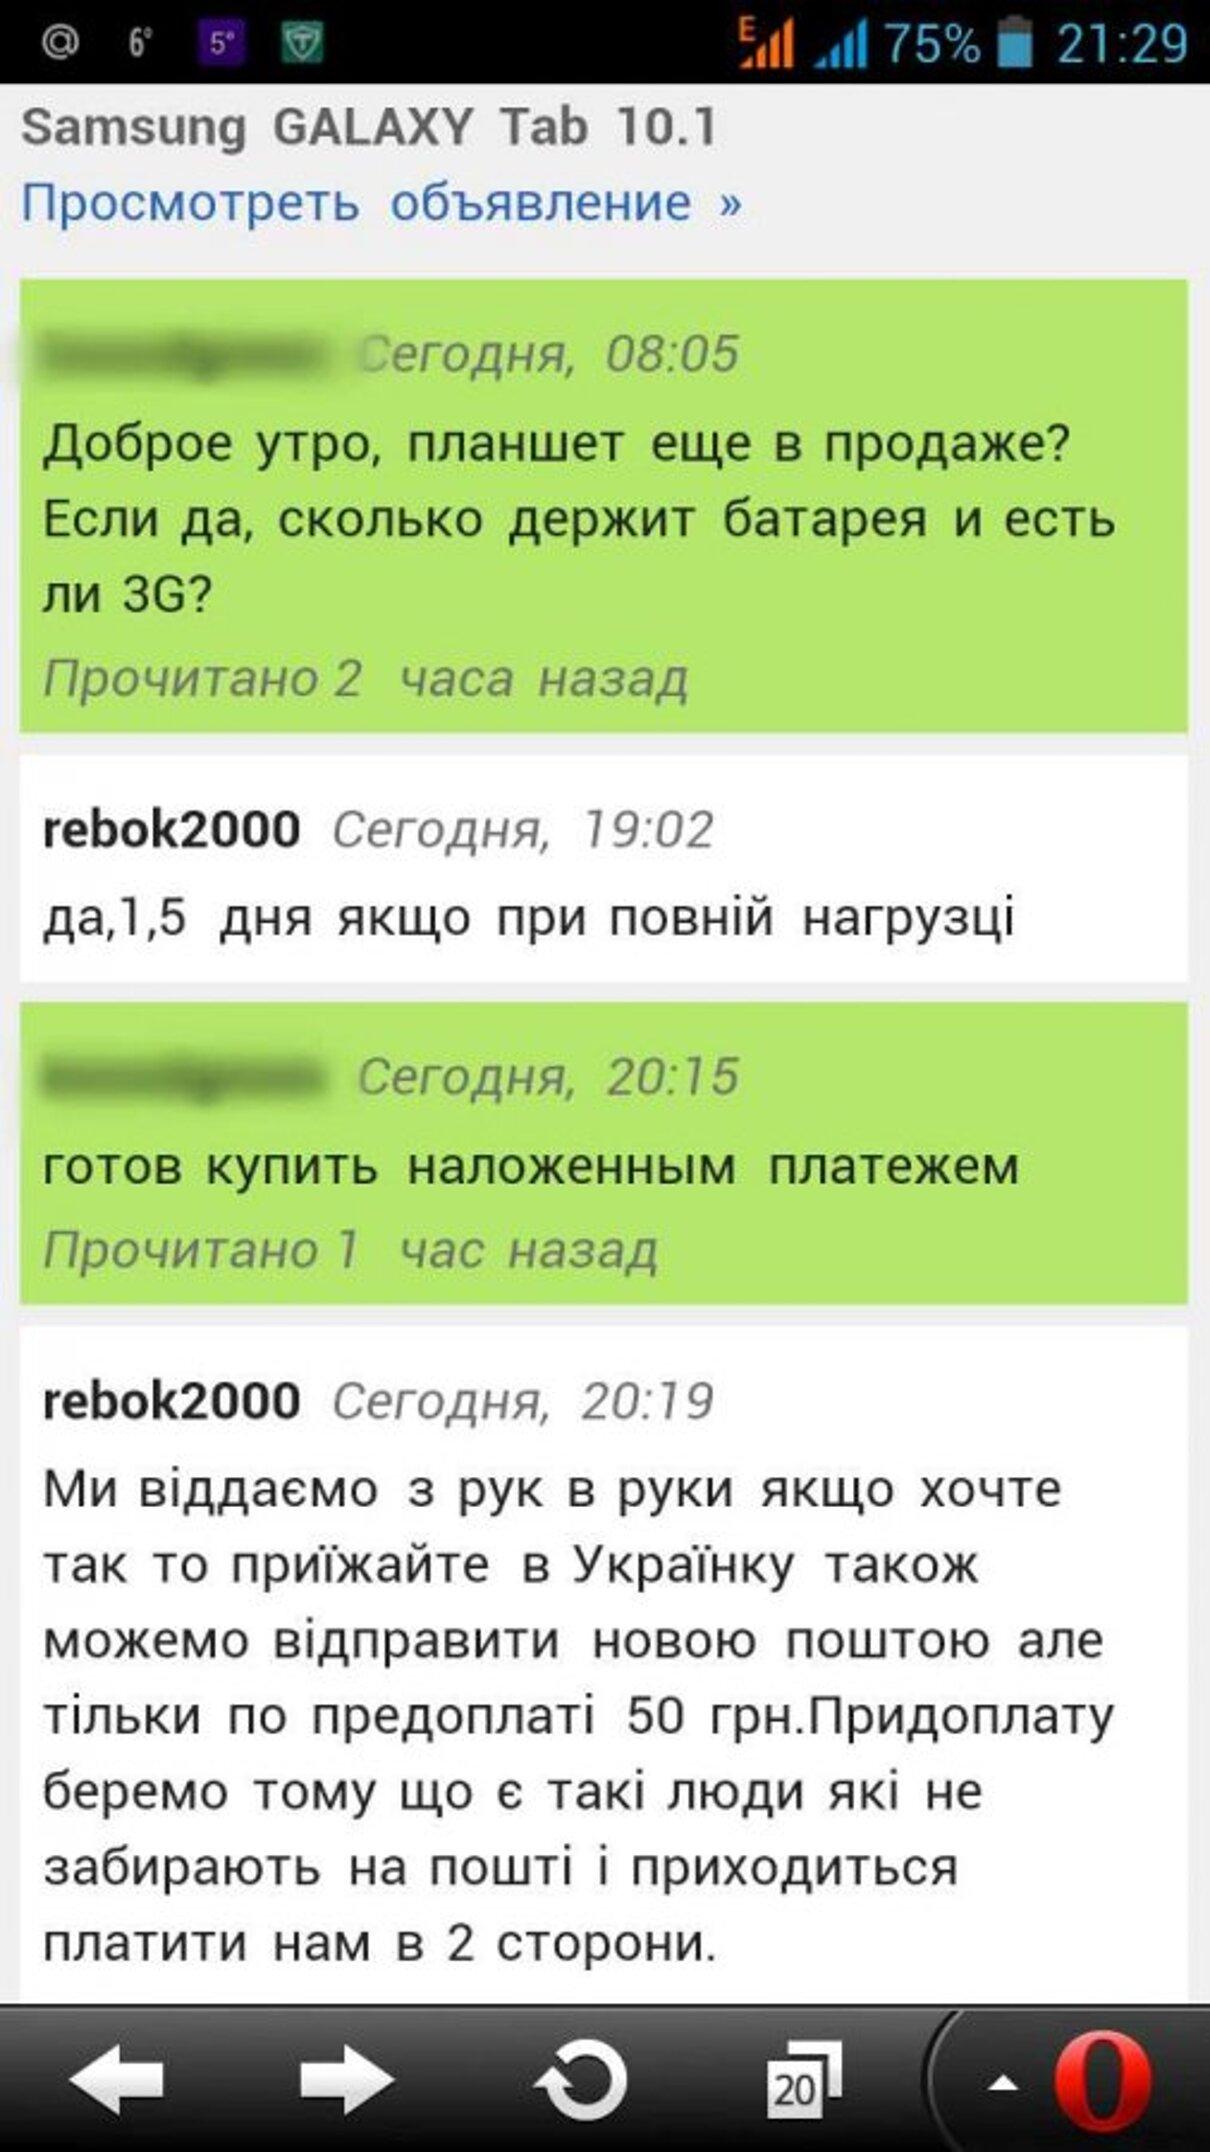 Жалоба-отзыв: Барилюк Ярослав Валерьевич - Мошенник на olx